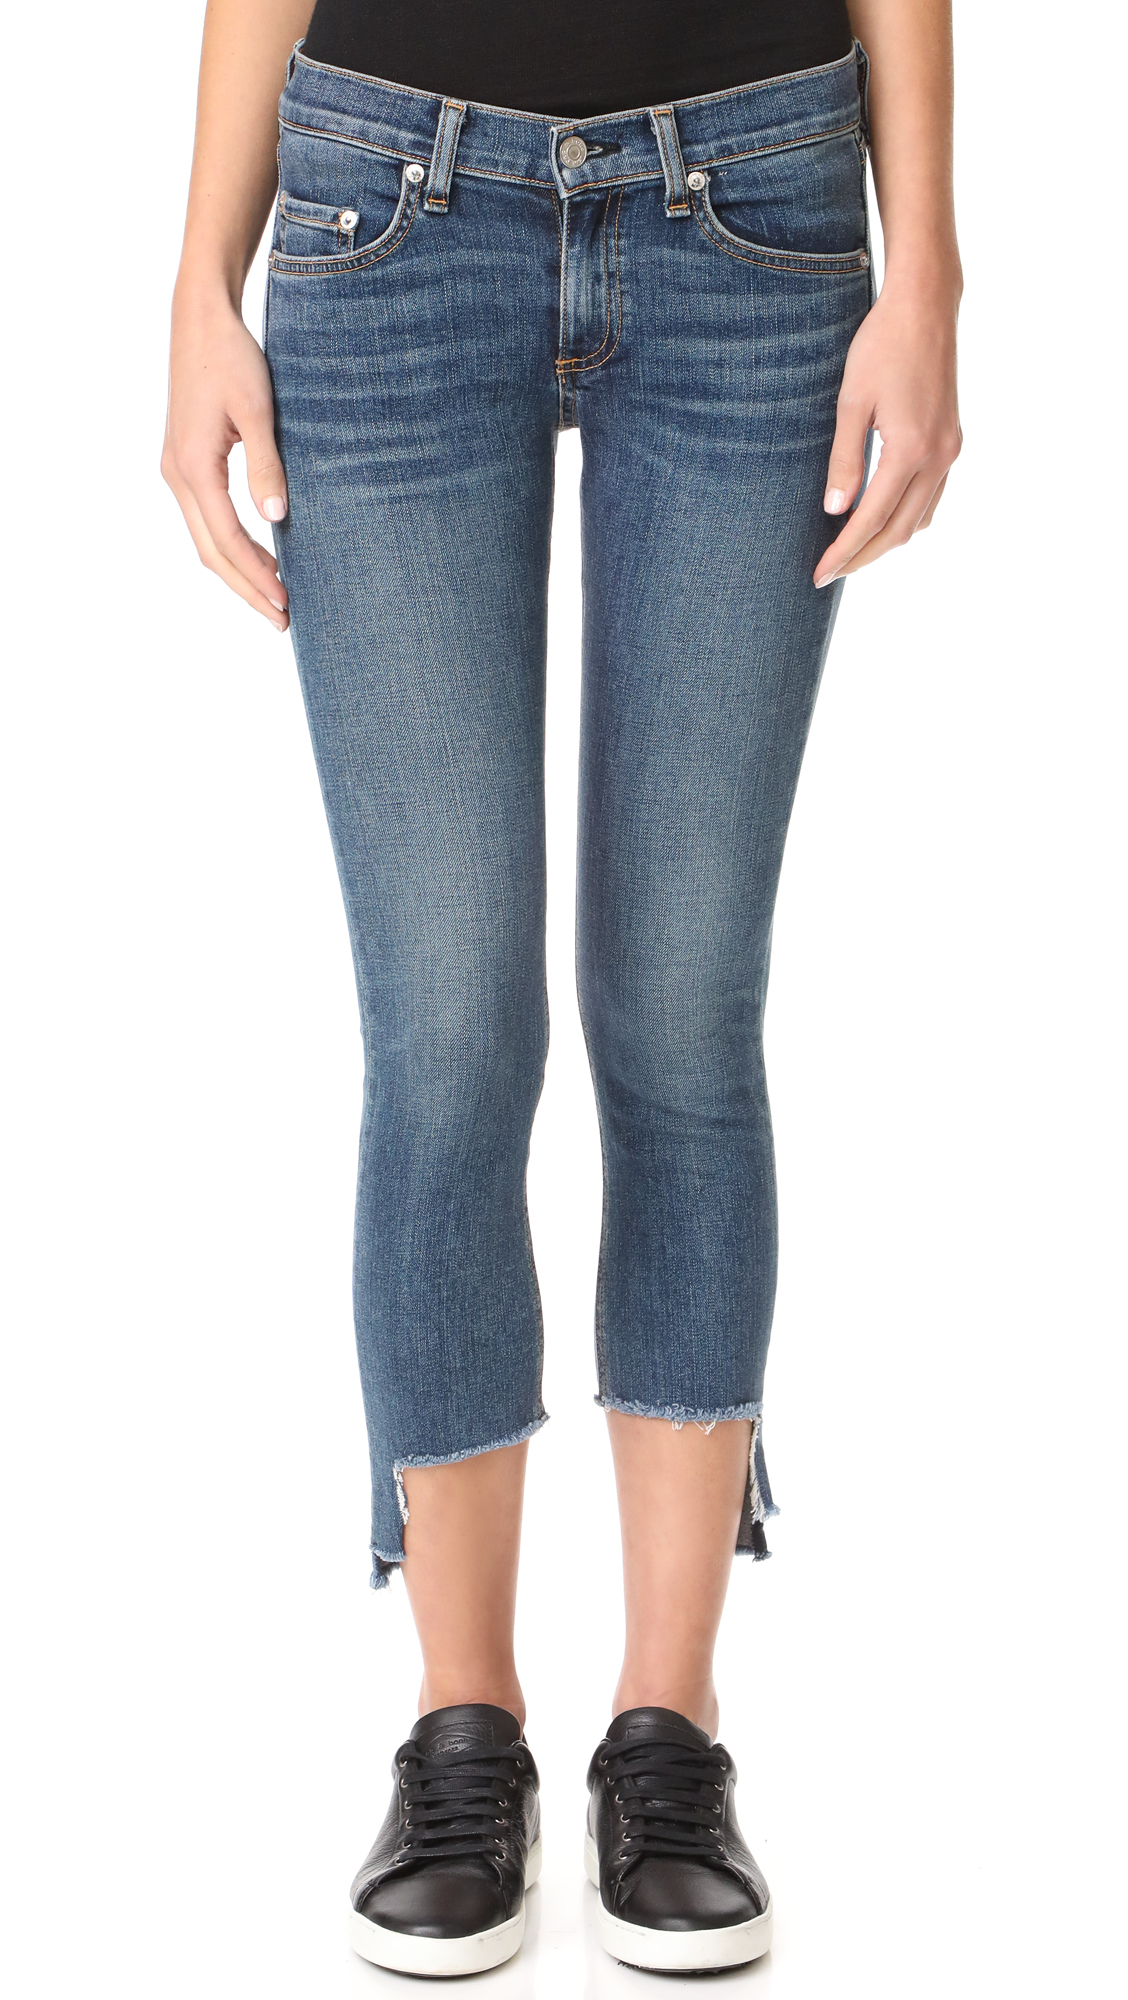 Rag & Bone/JEAN Capri Jeans - Hampton